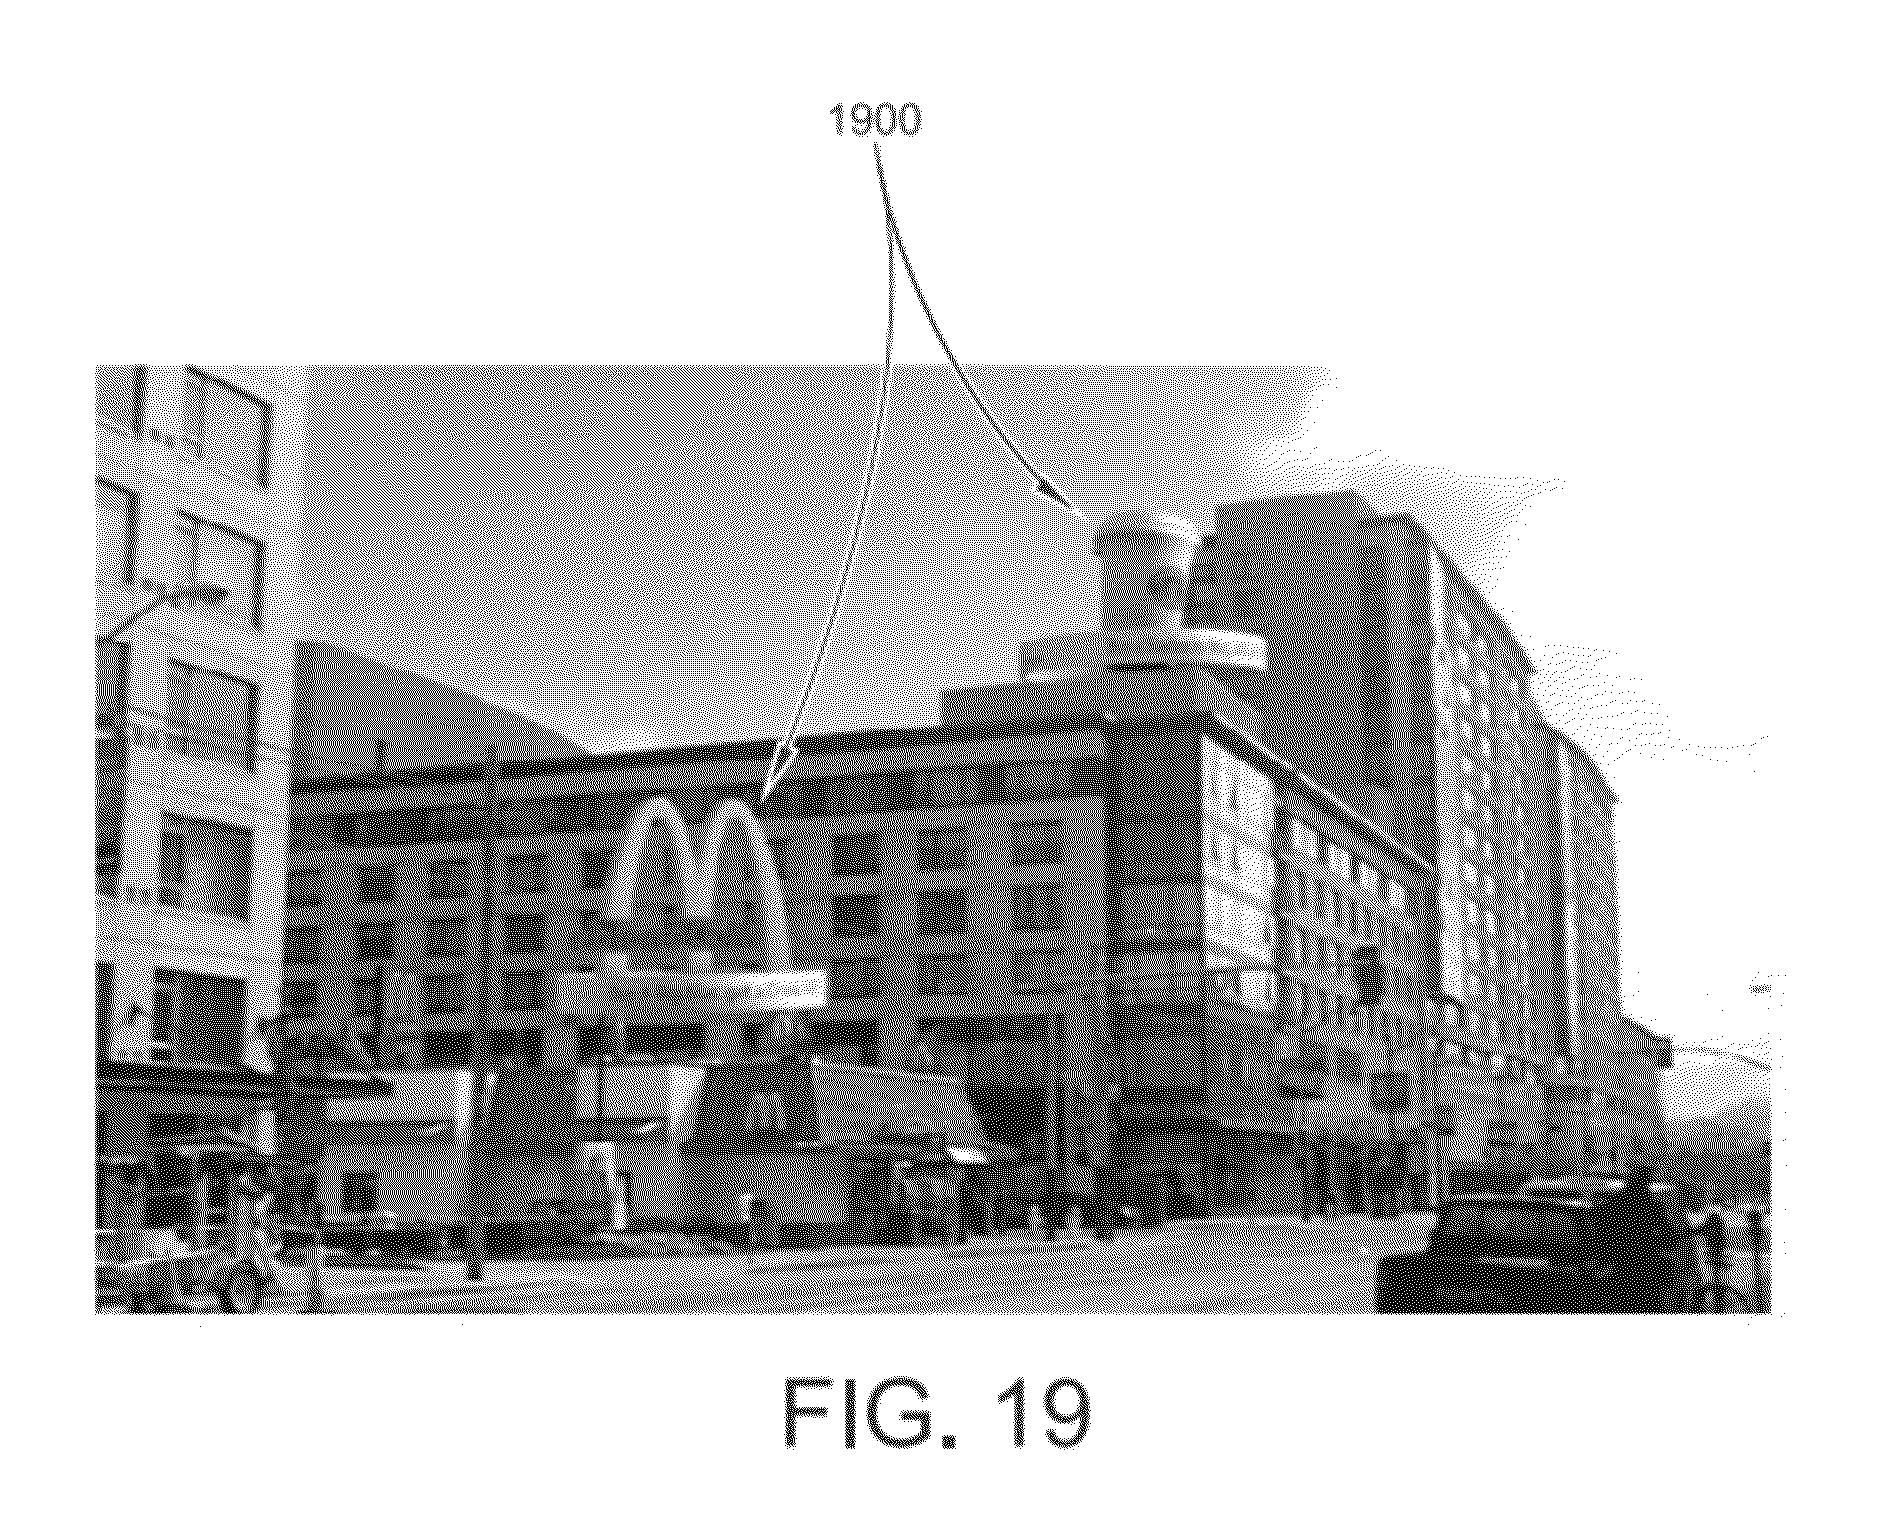 Patent US 9,128,281 B2